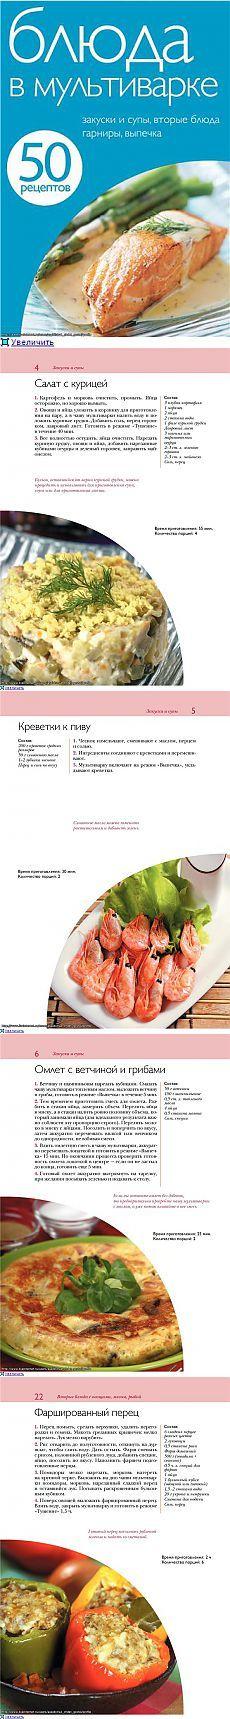 50 рецептов. Блюда в мультиварке (Е. Левашева)